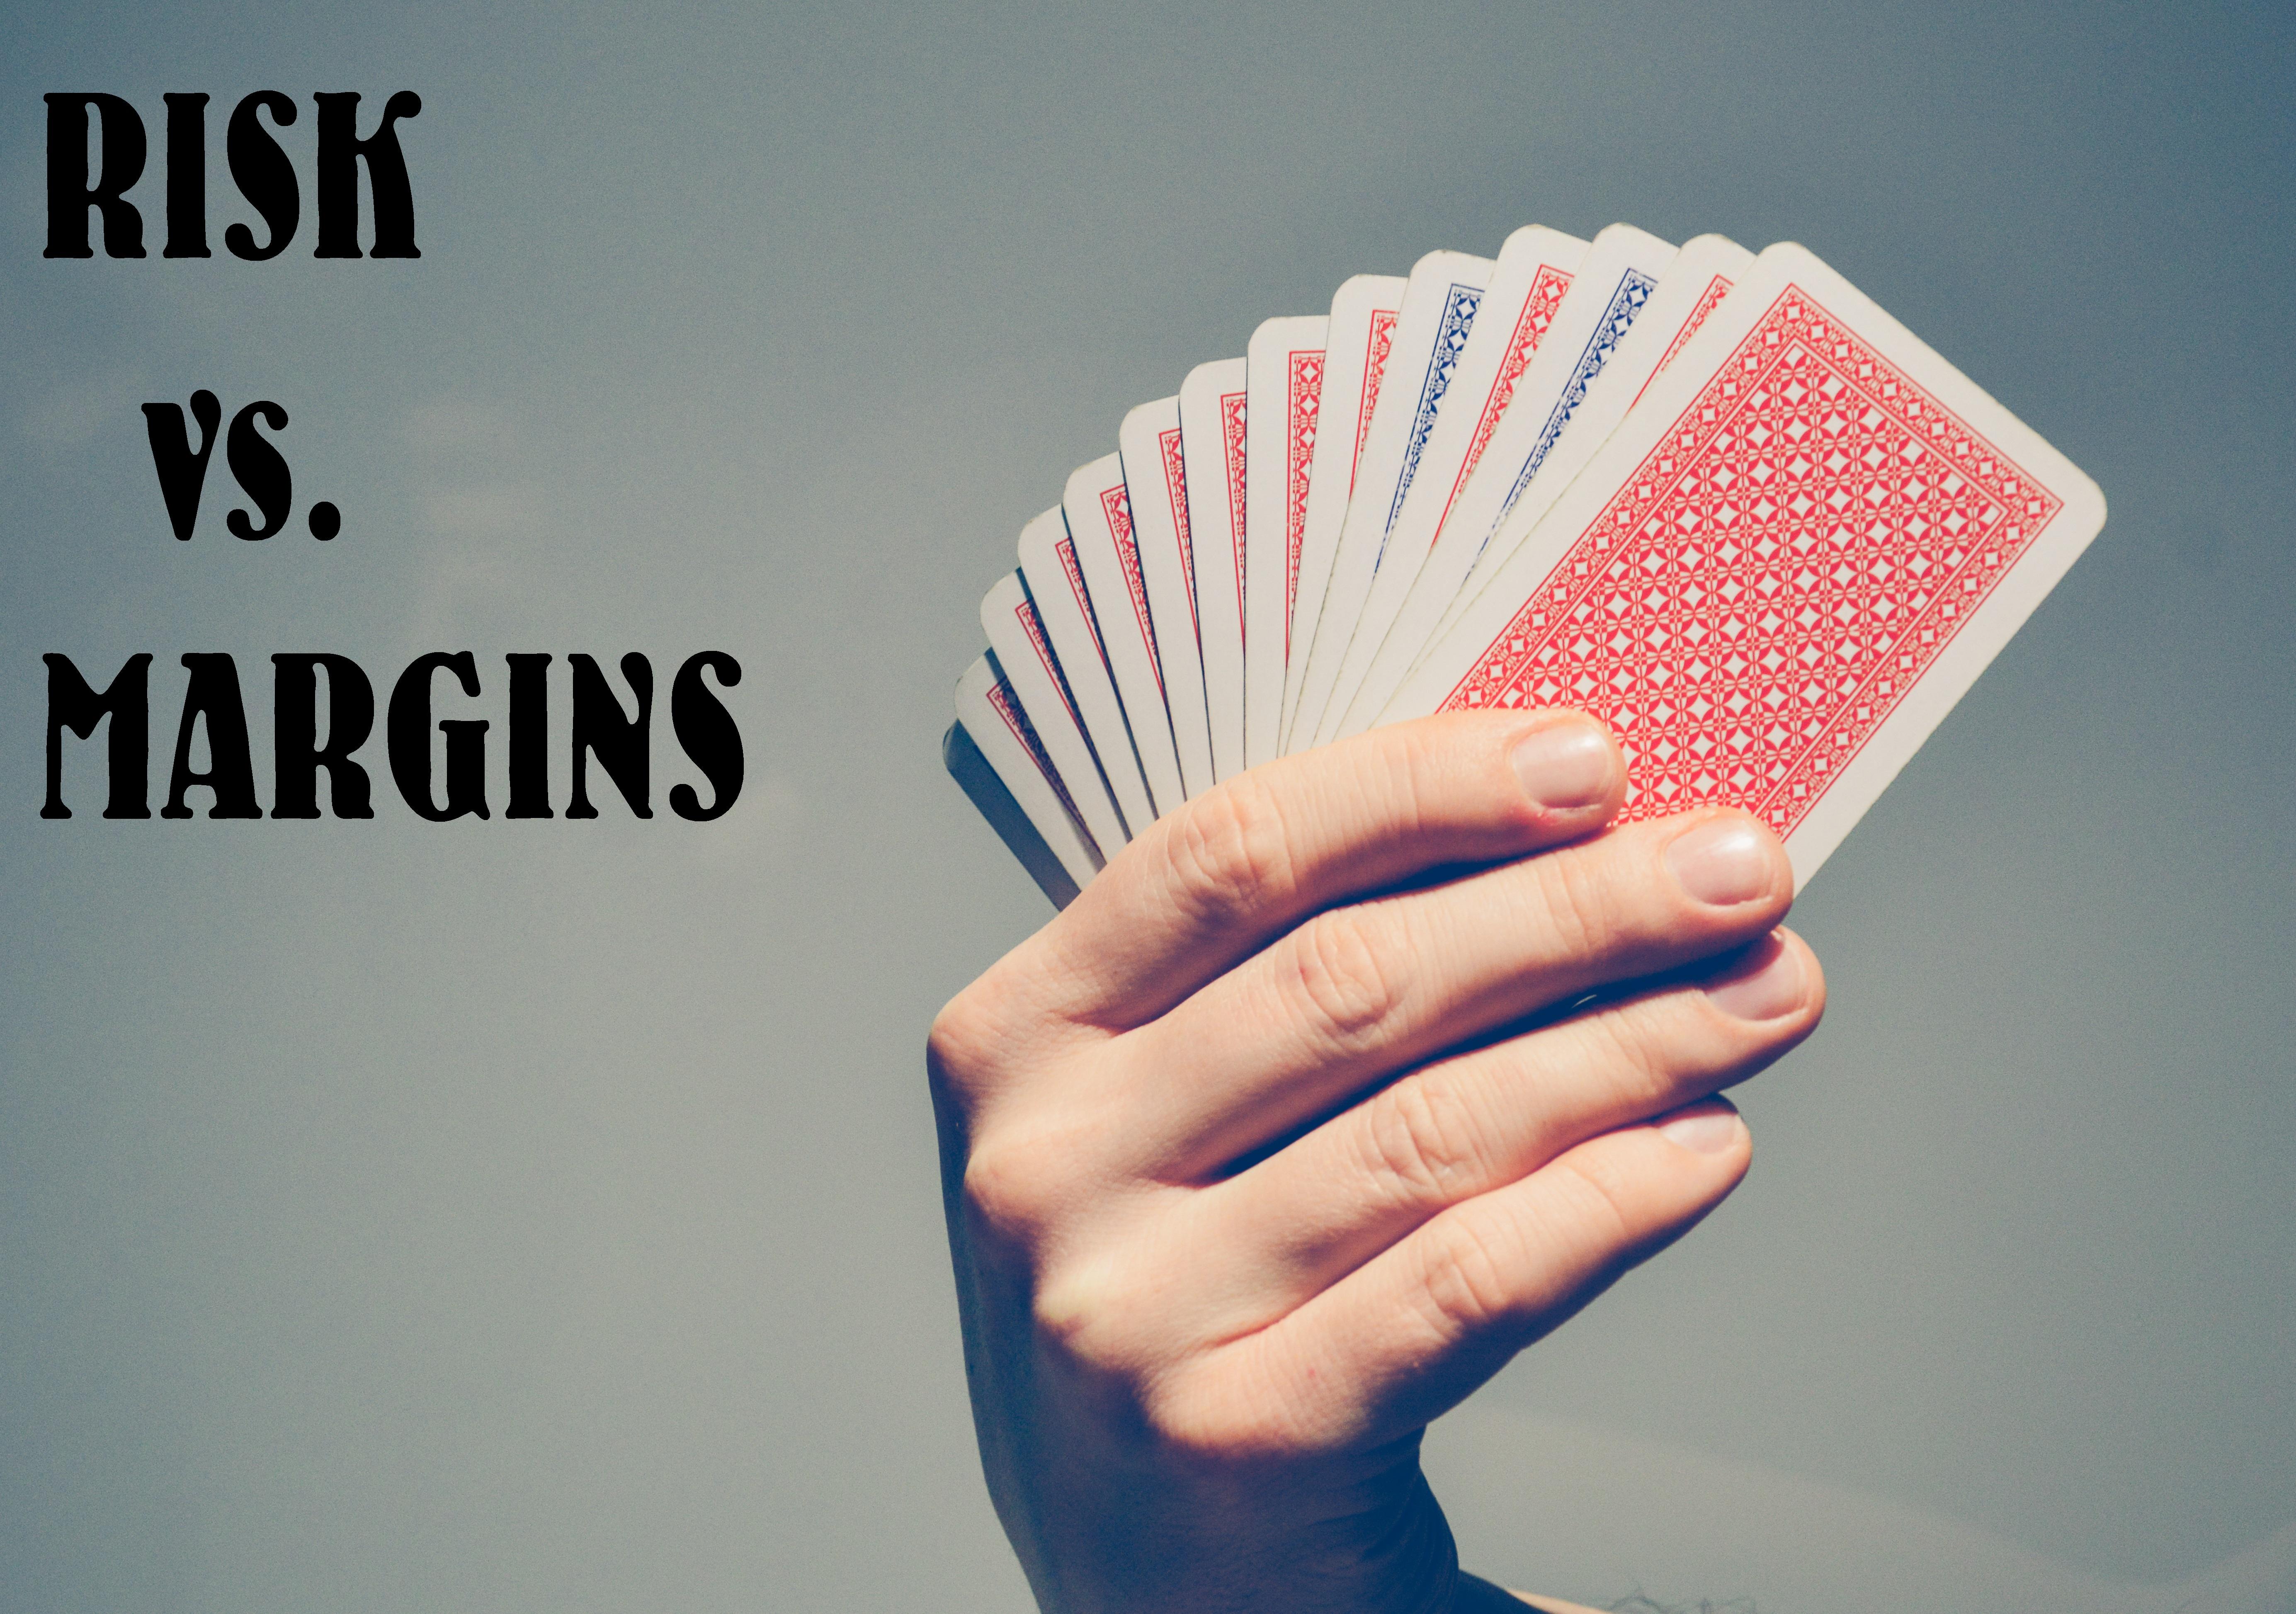 managing risk with profit margins